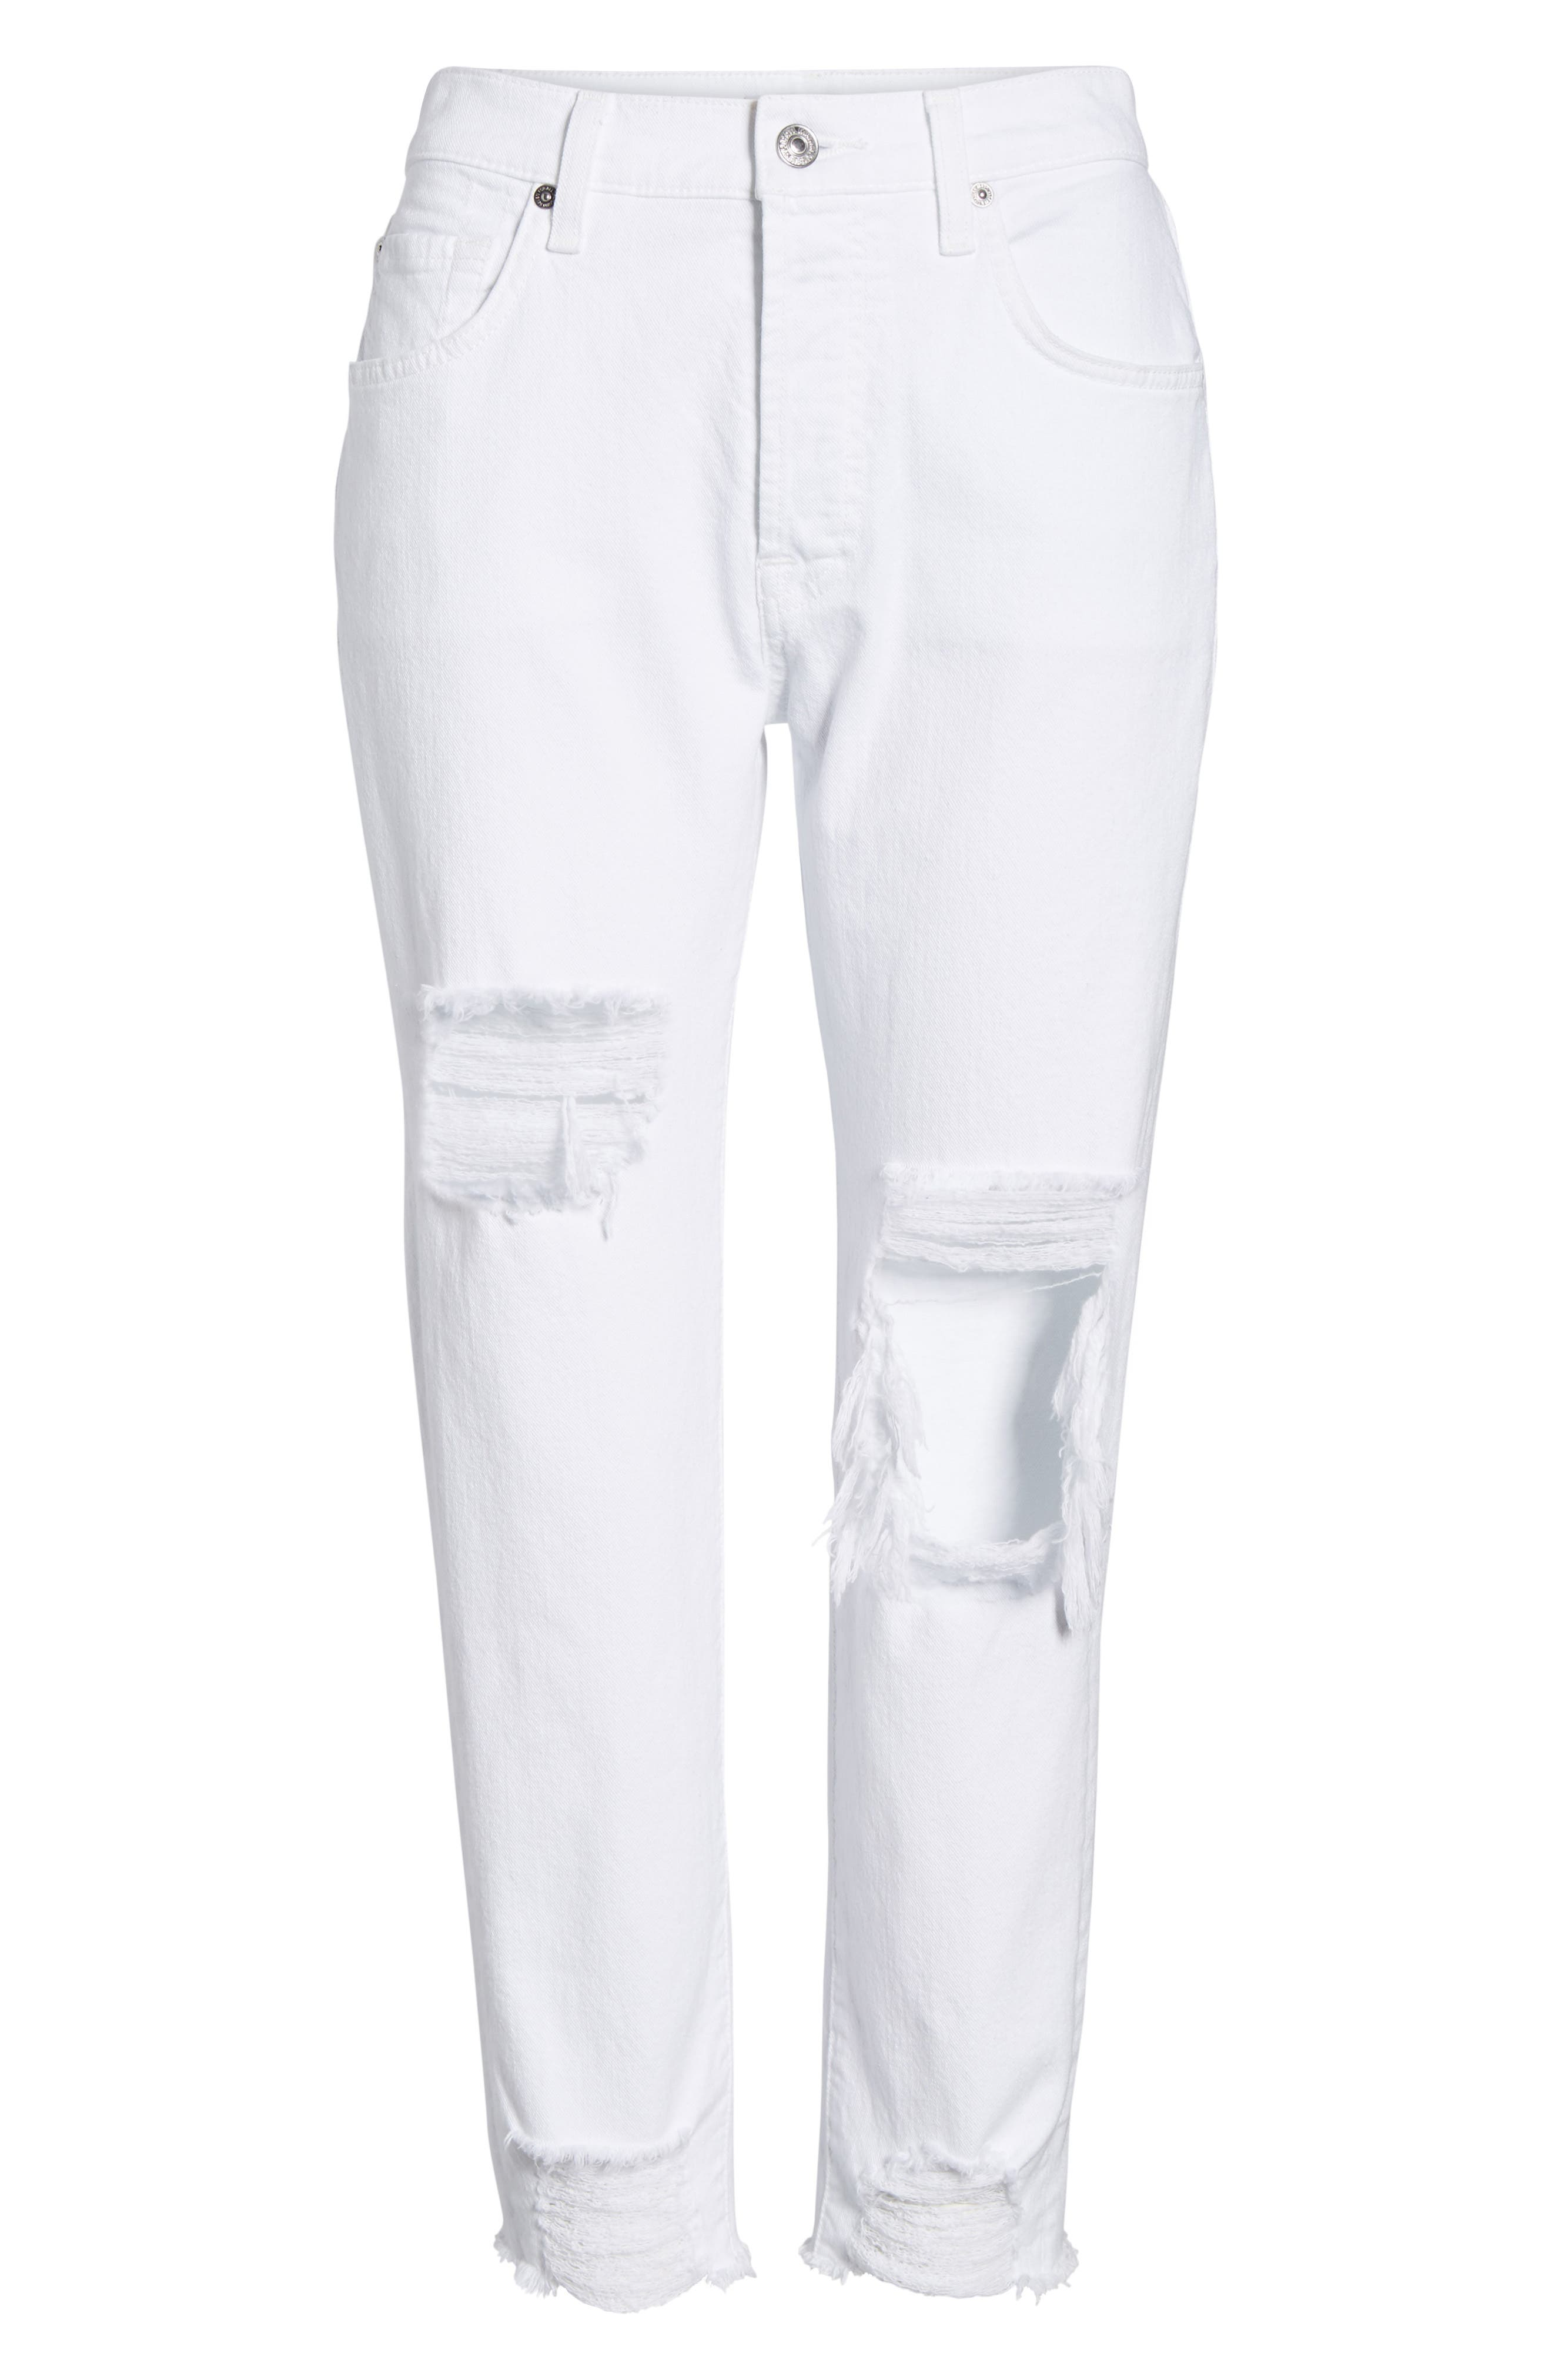 Josefina High Waist Boyfriend Jeans,                             Alternate thumbnail 7, color,                             101